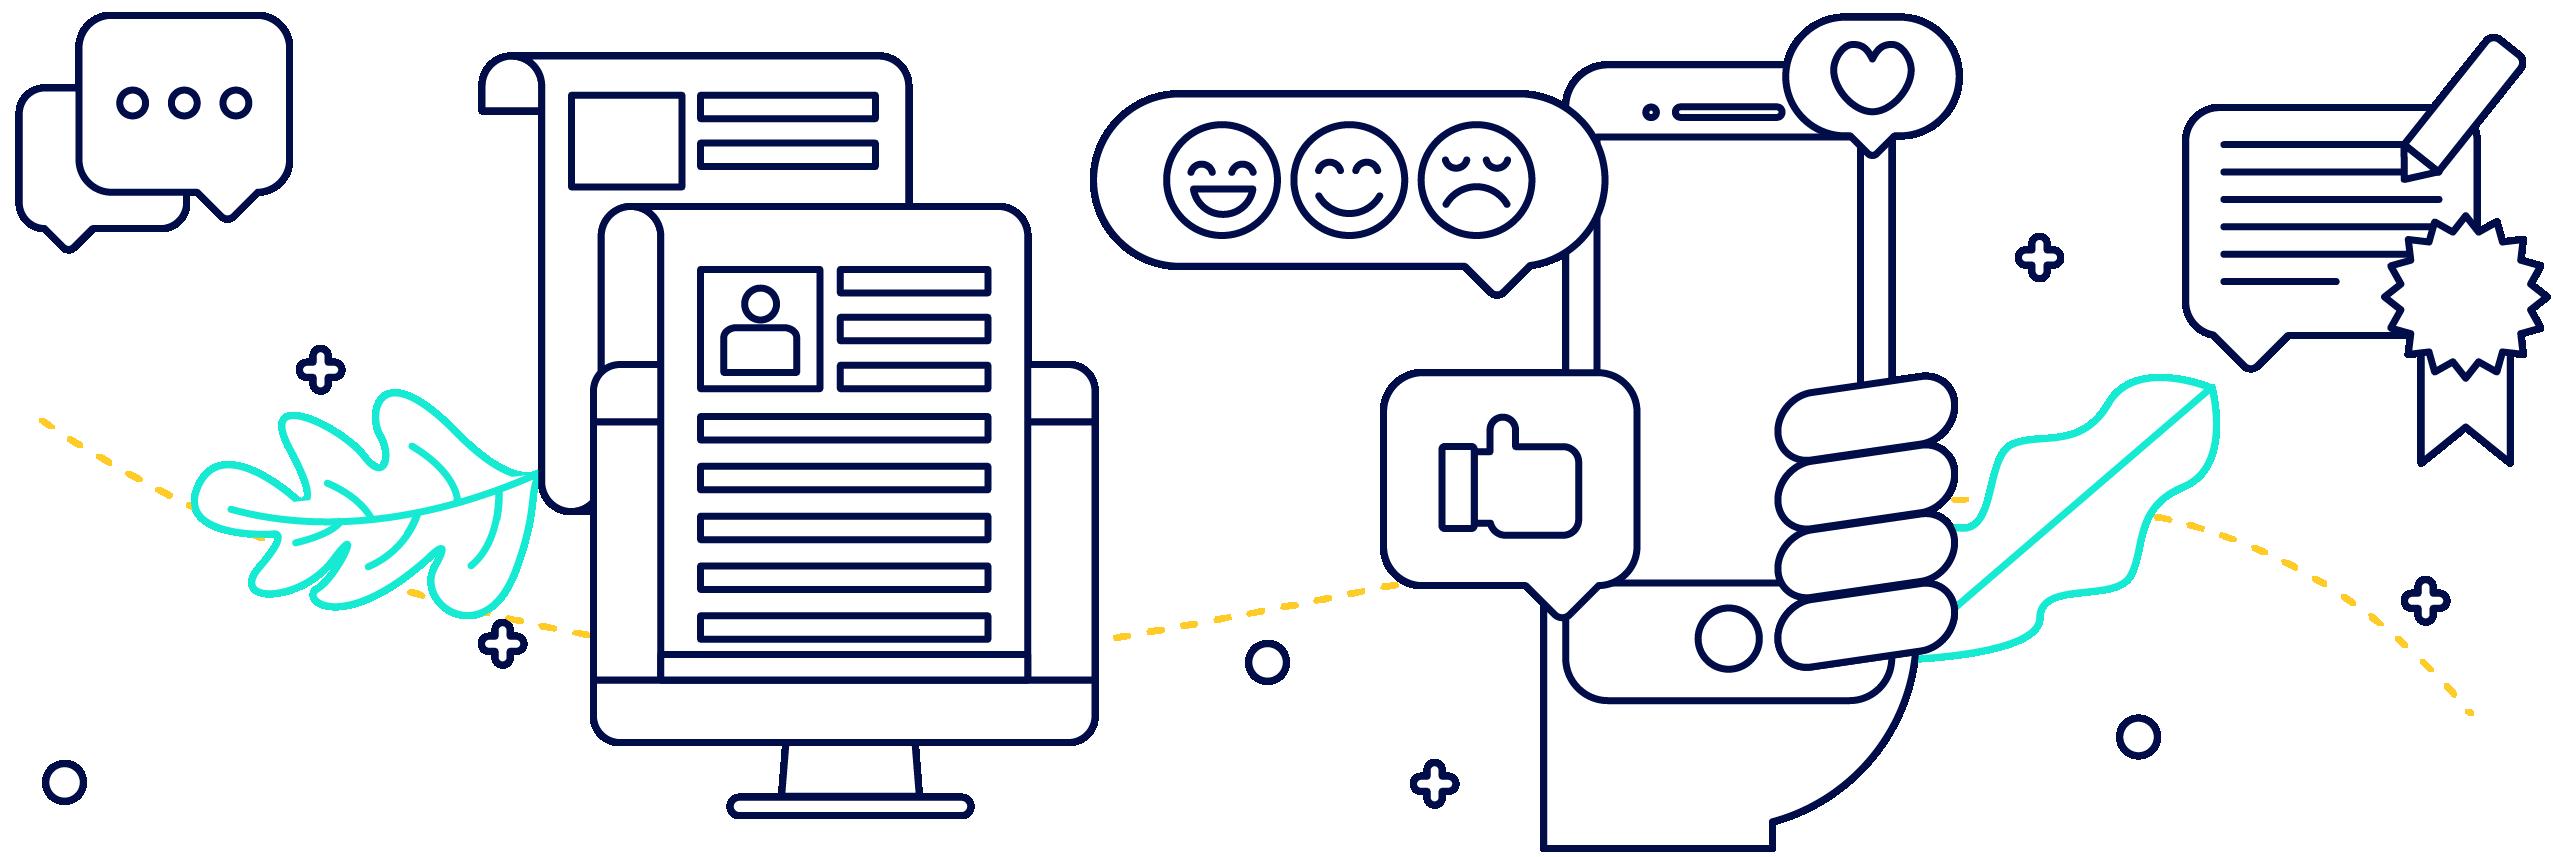 Articulate - 03-15 eye-opening B2B social media statistics - The best B2B social media platforms - How to use social media well-01